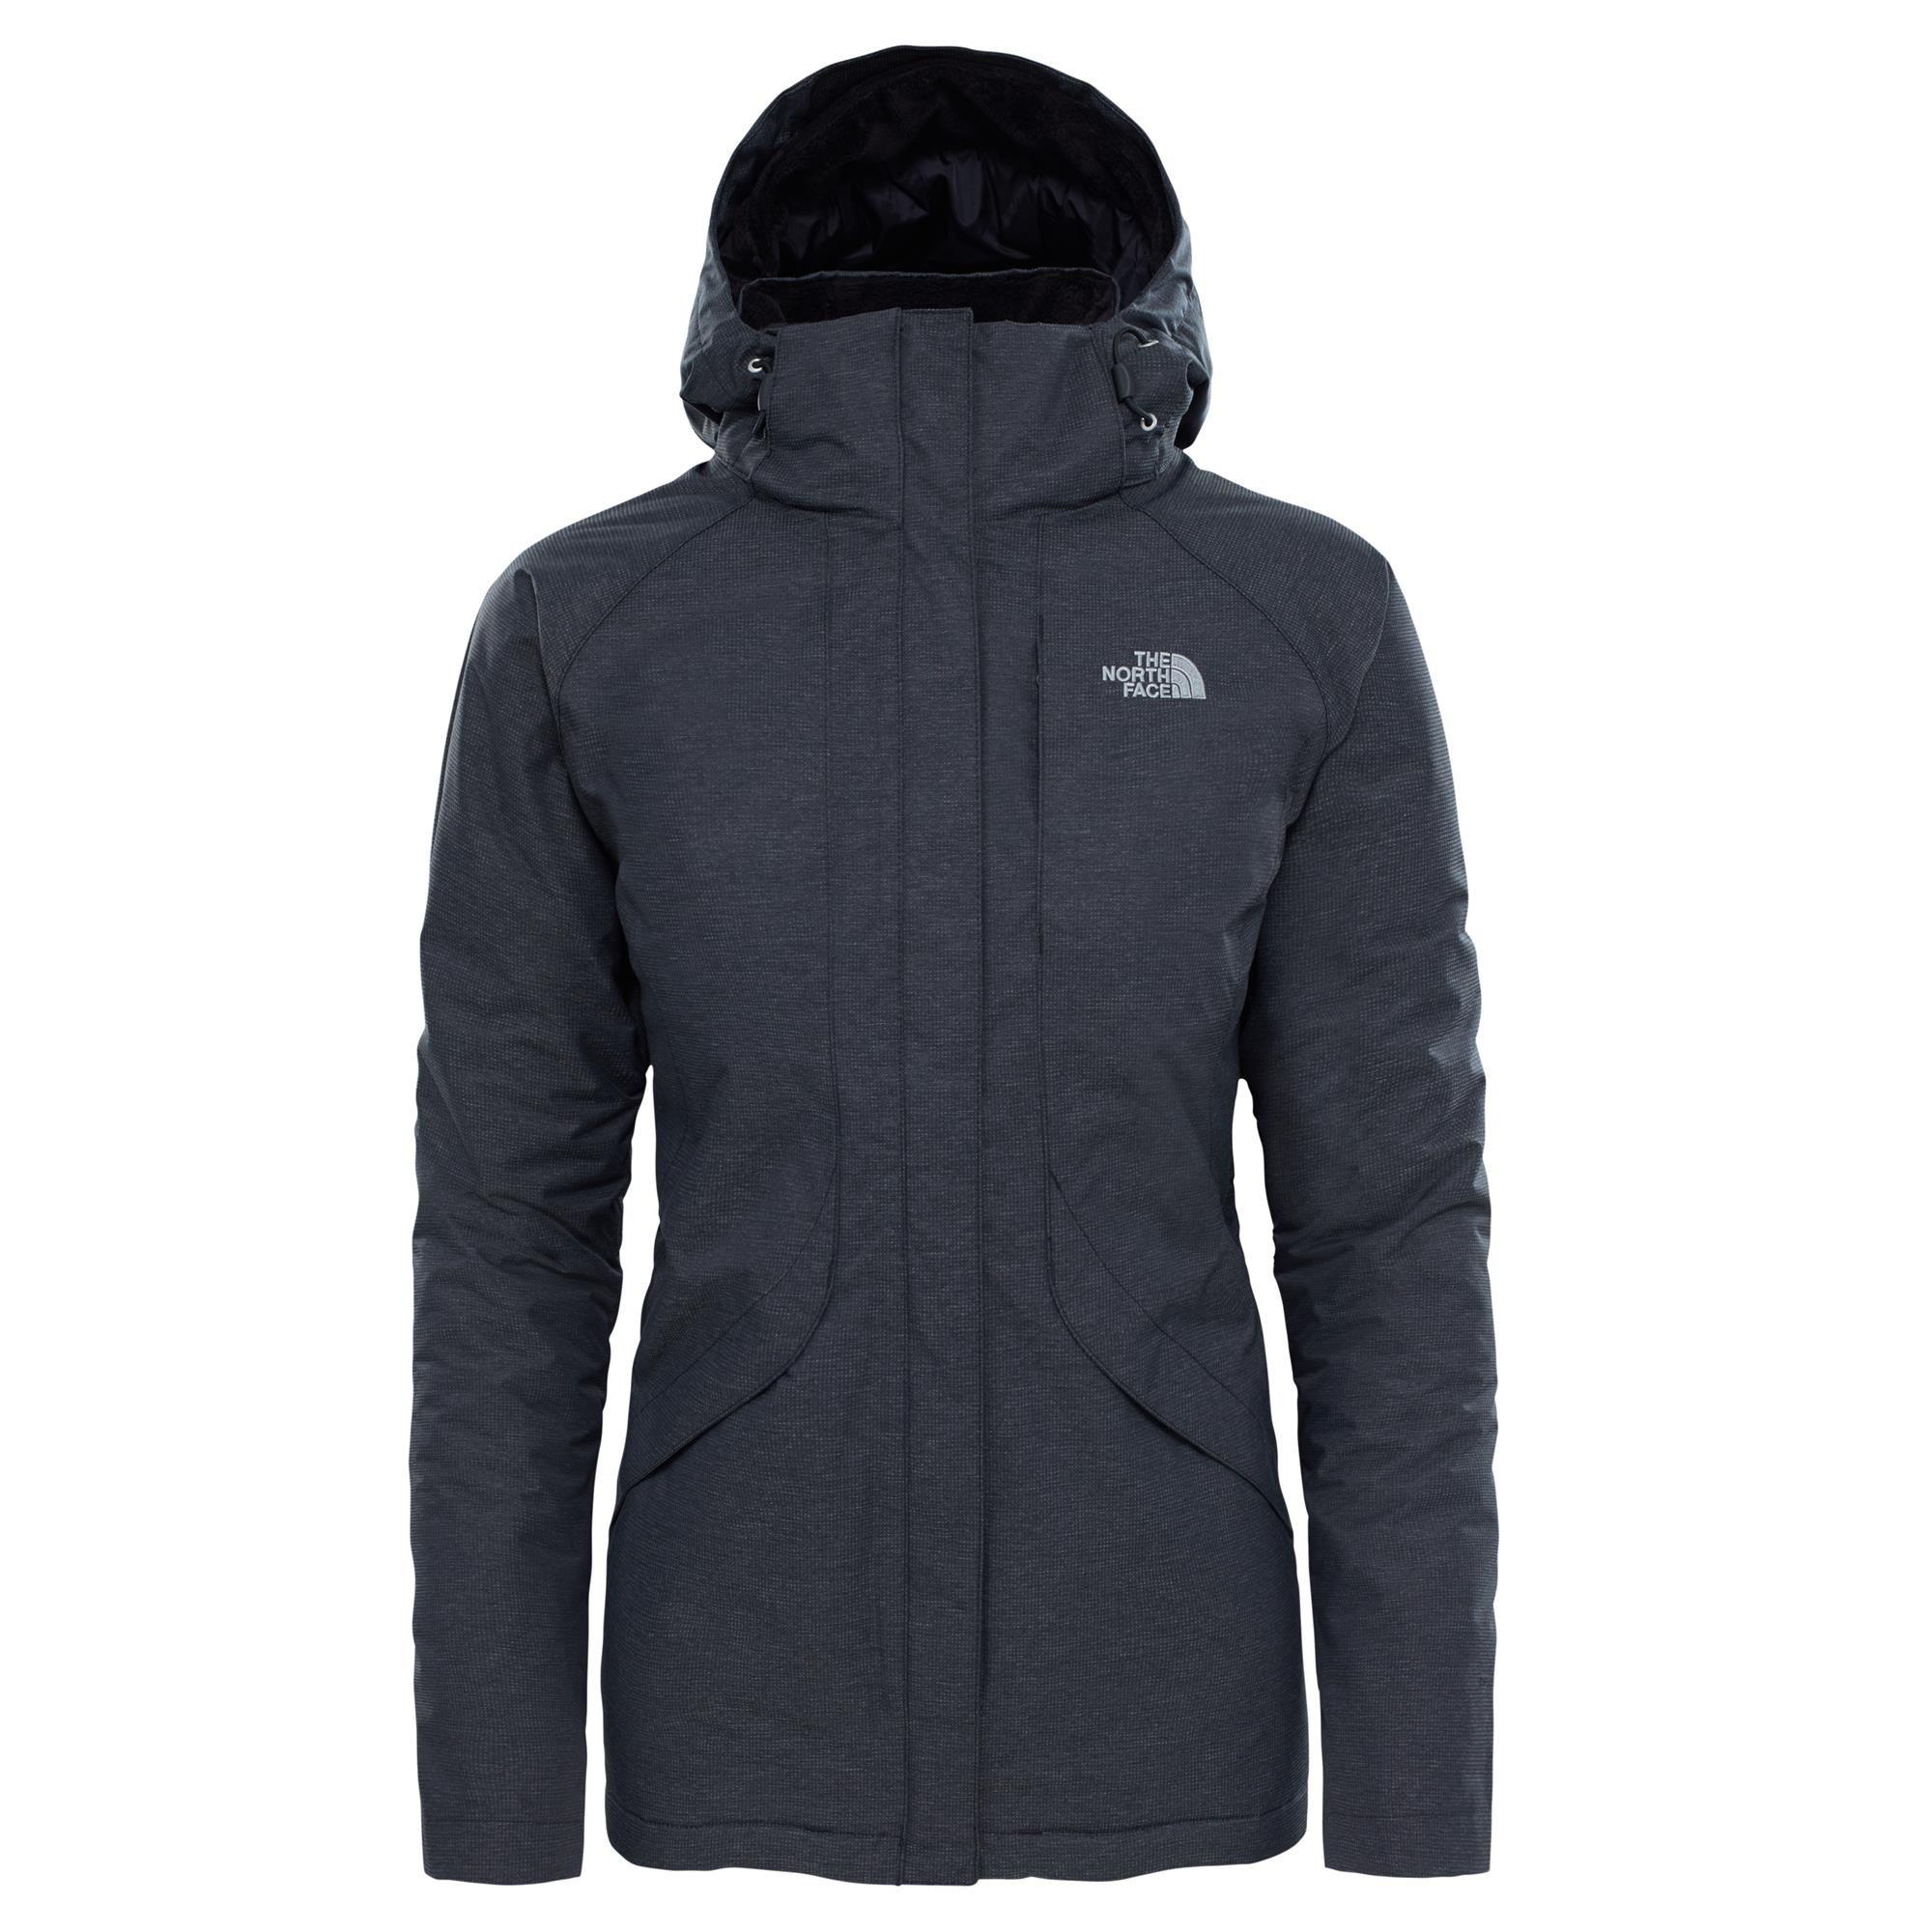 a4d7864b78 Xtend-Angebote The North Face W Inlux Insulated Jacket Winterjacke Damen  schwarz Gr. M